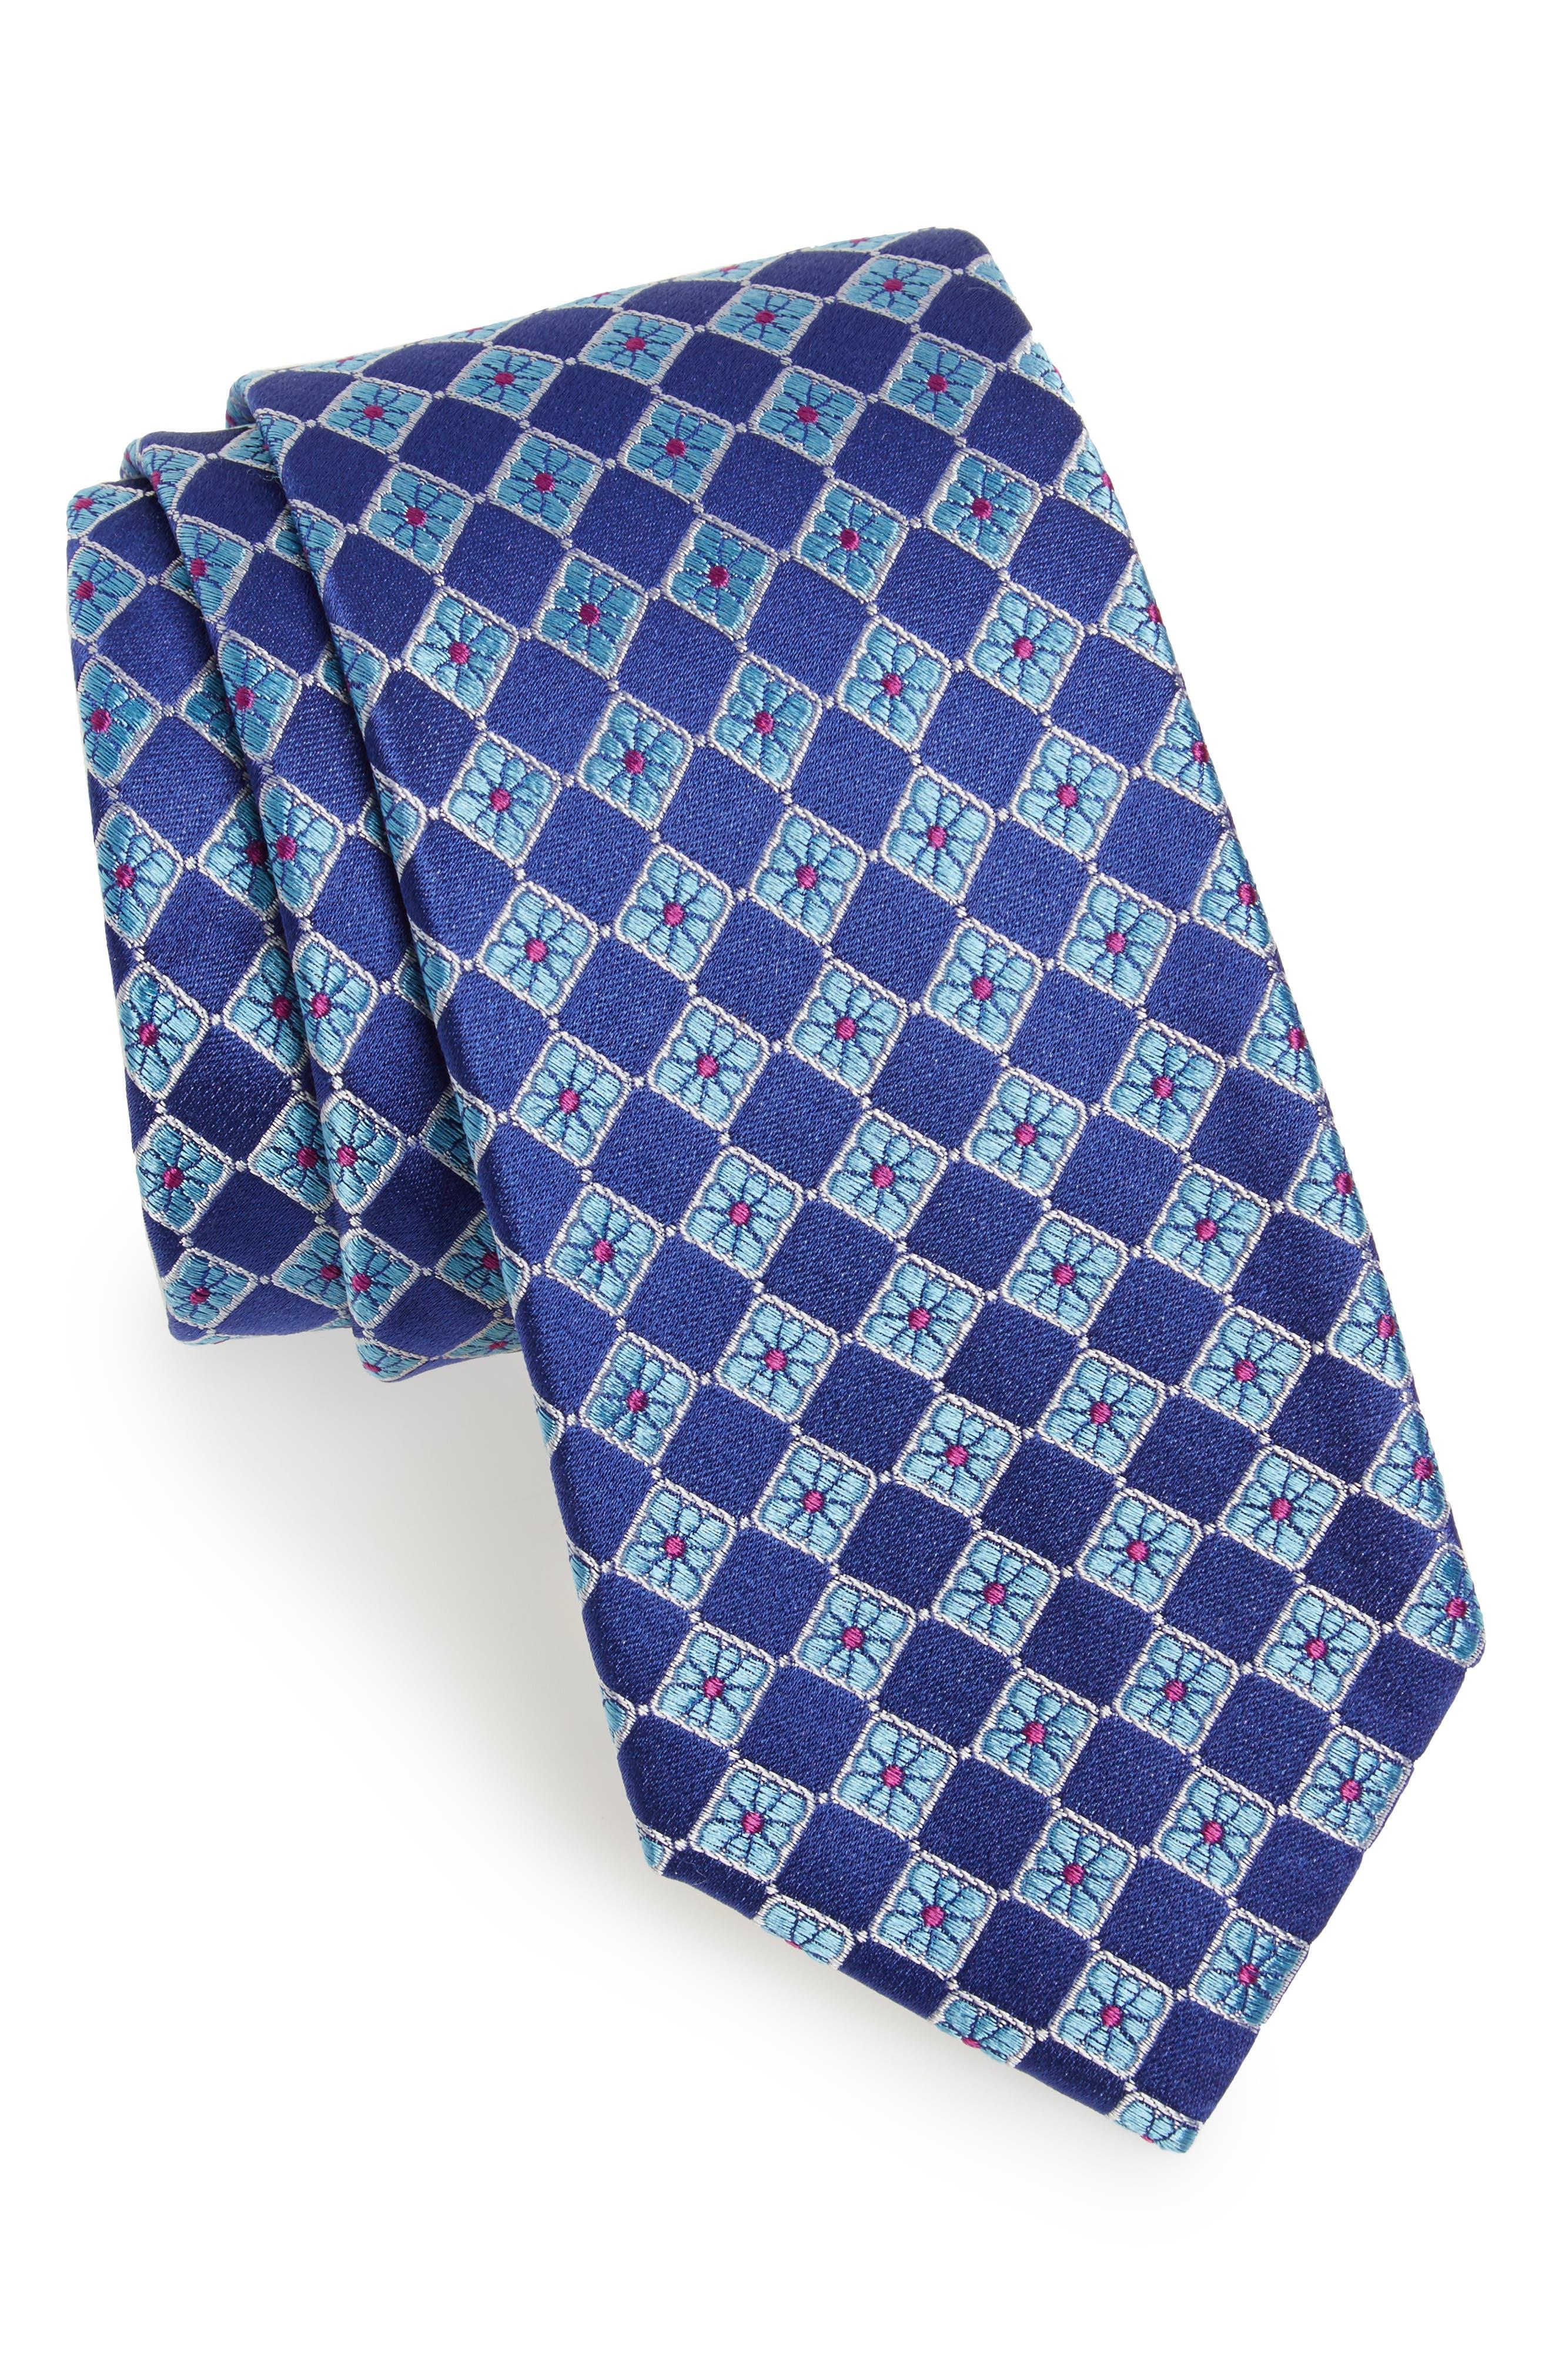 Main Image - Nordstrom Men's Shop Floral Squares Silk Tie